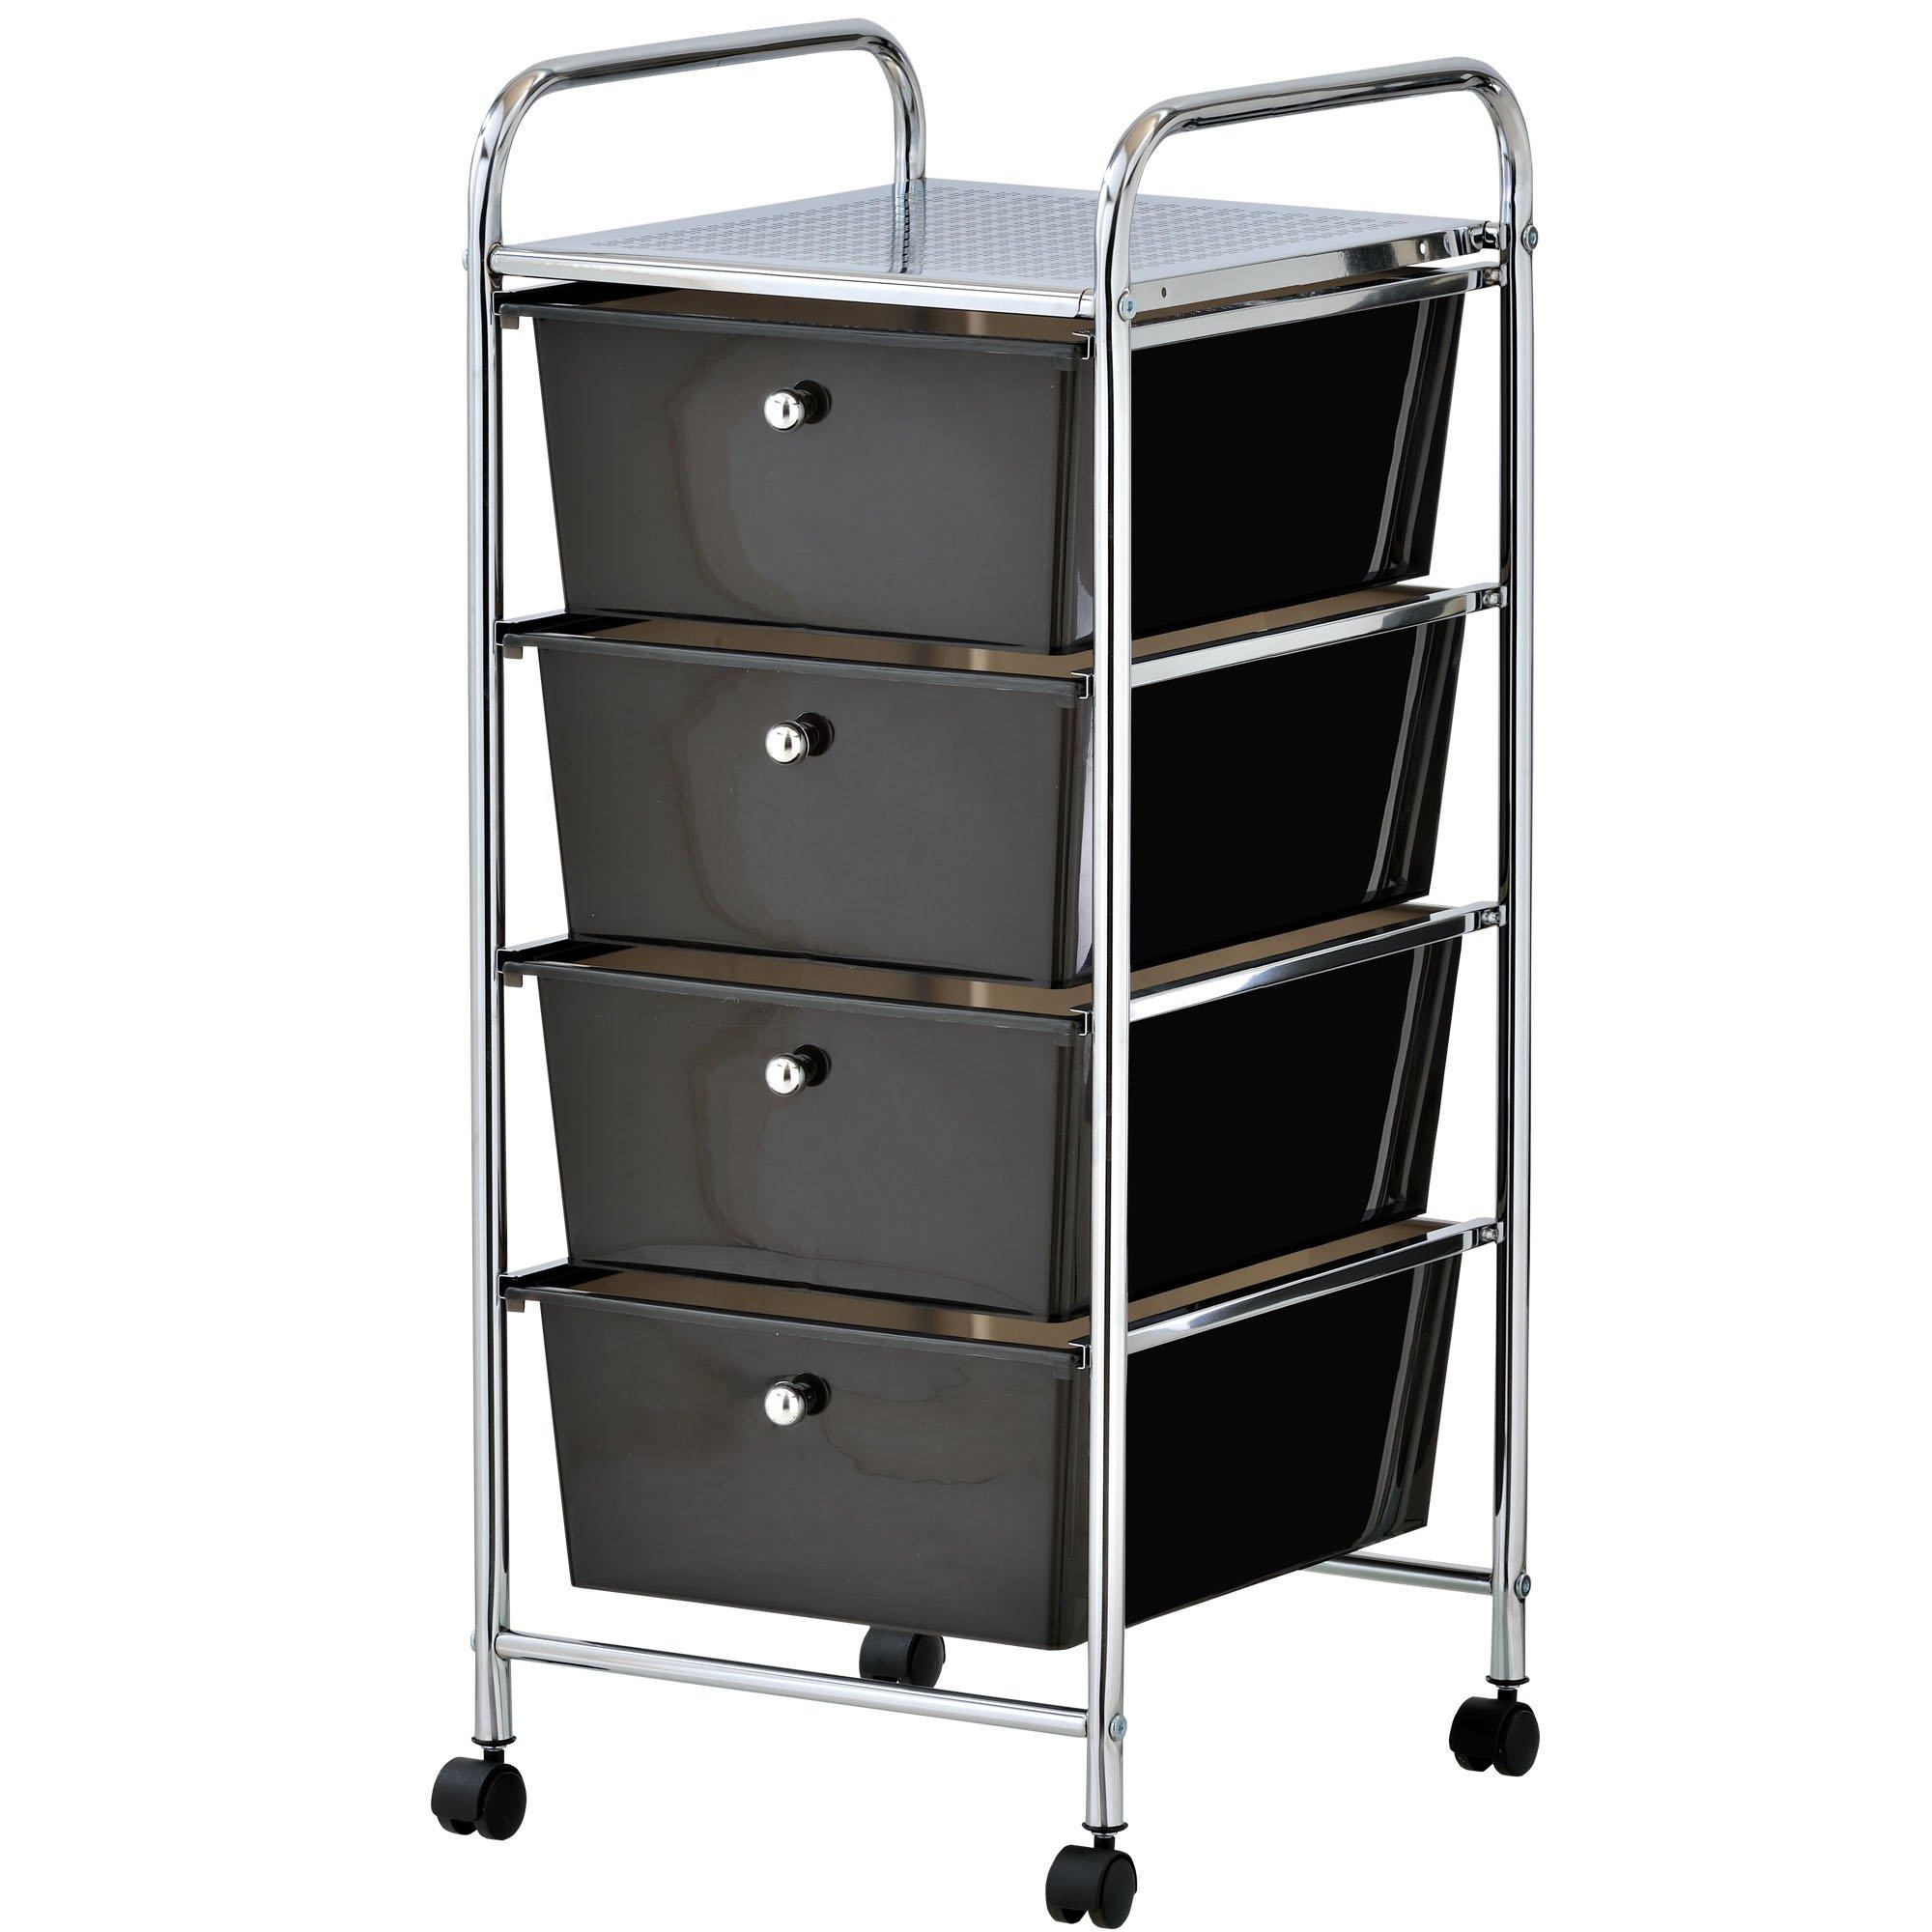 pedestal drawer fine on desk top innovation under with drawers table wheels plastic storage